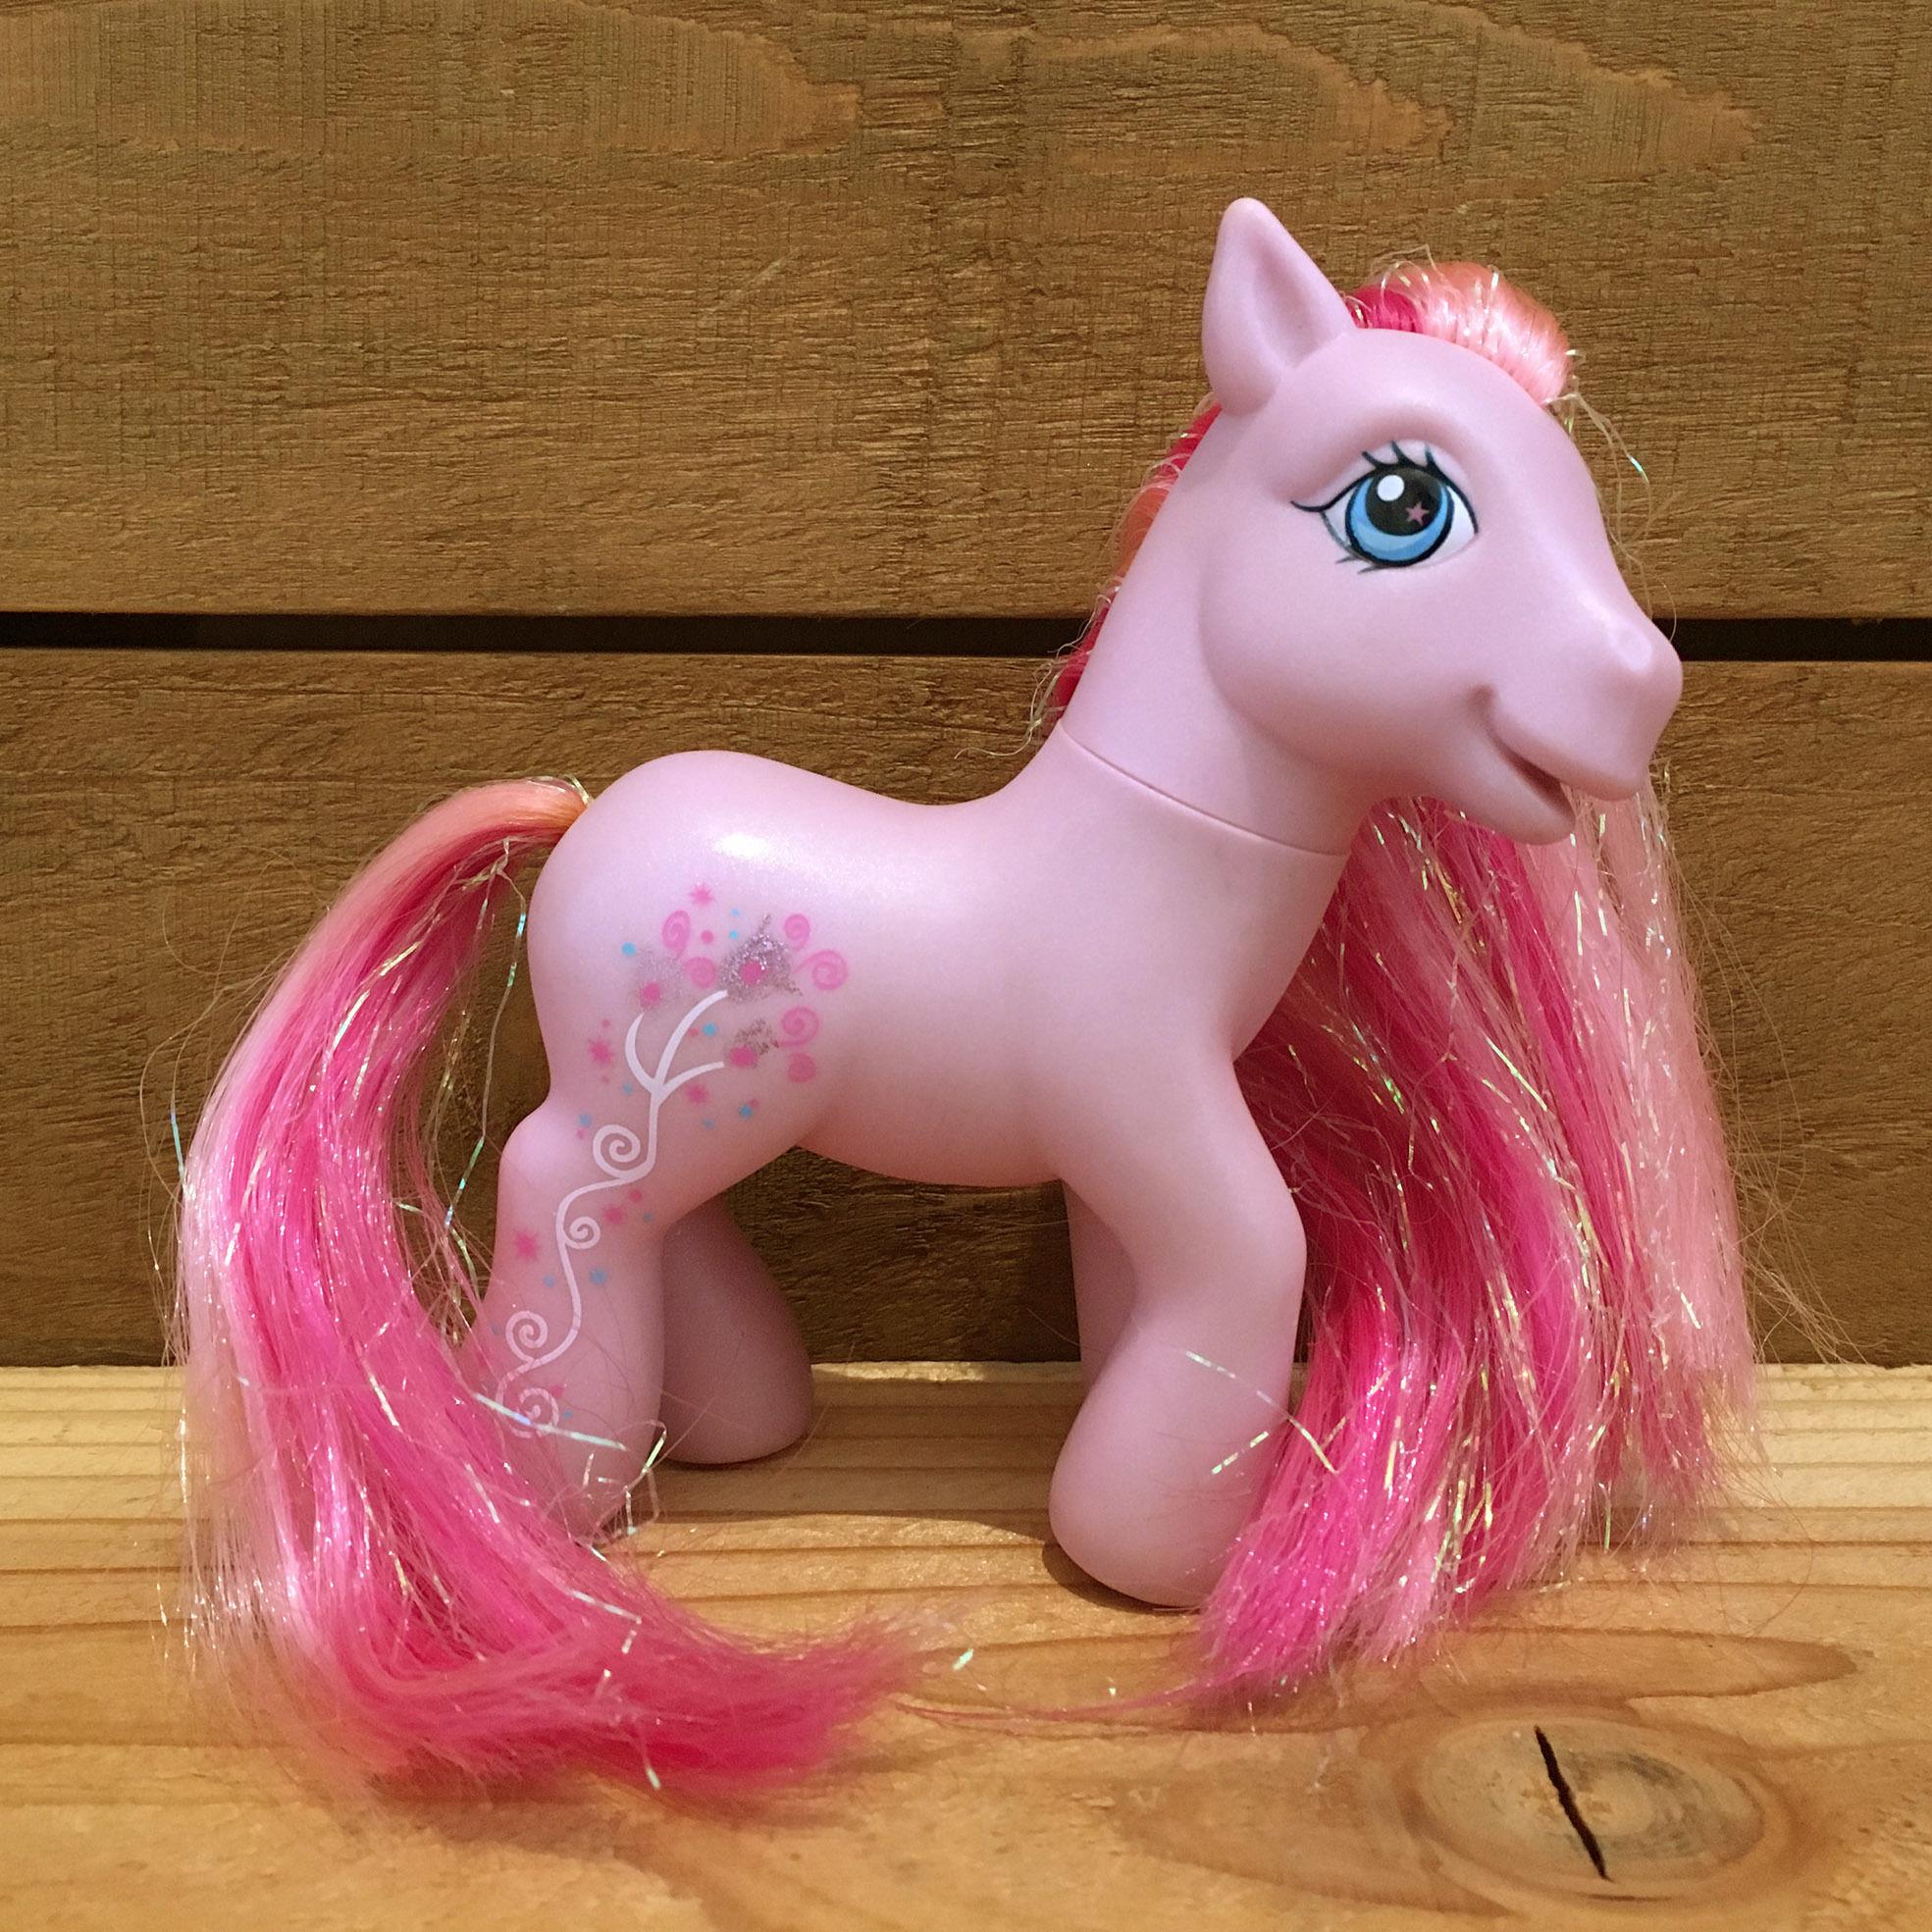 G3 My Little Pony Tulip Twinkle/G3マイリトルポニー チューリップトゥインクル/180301-4